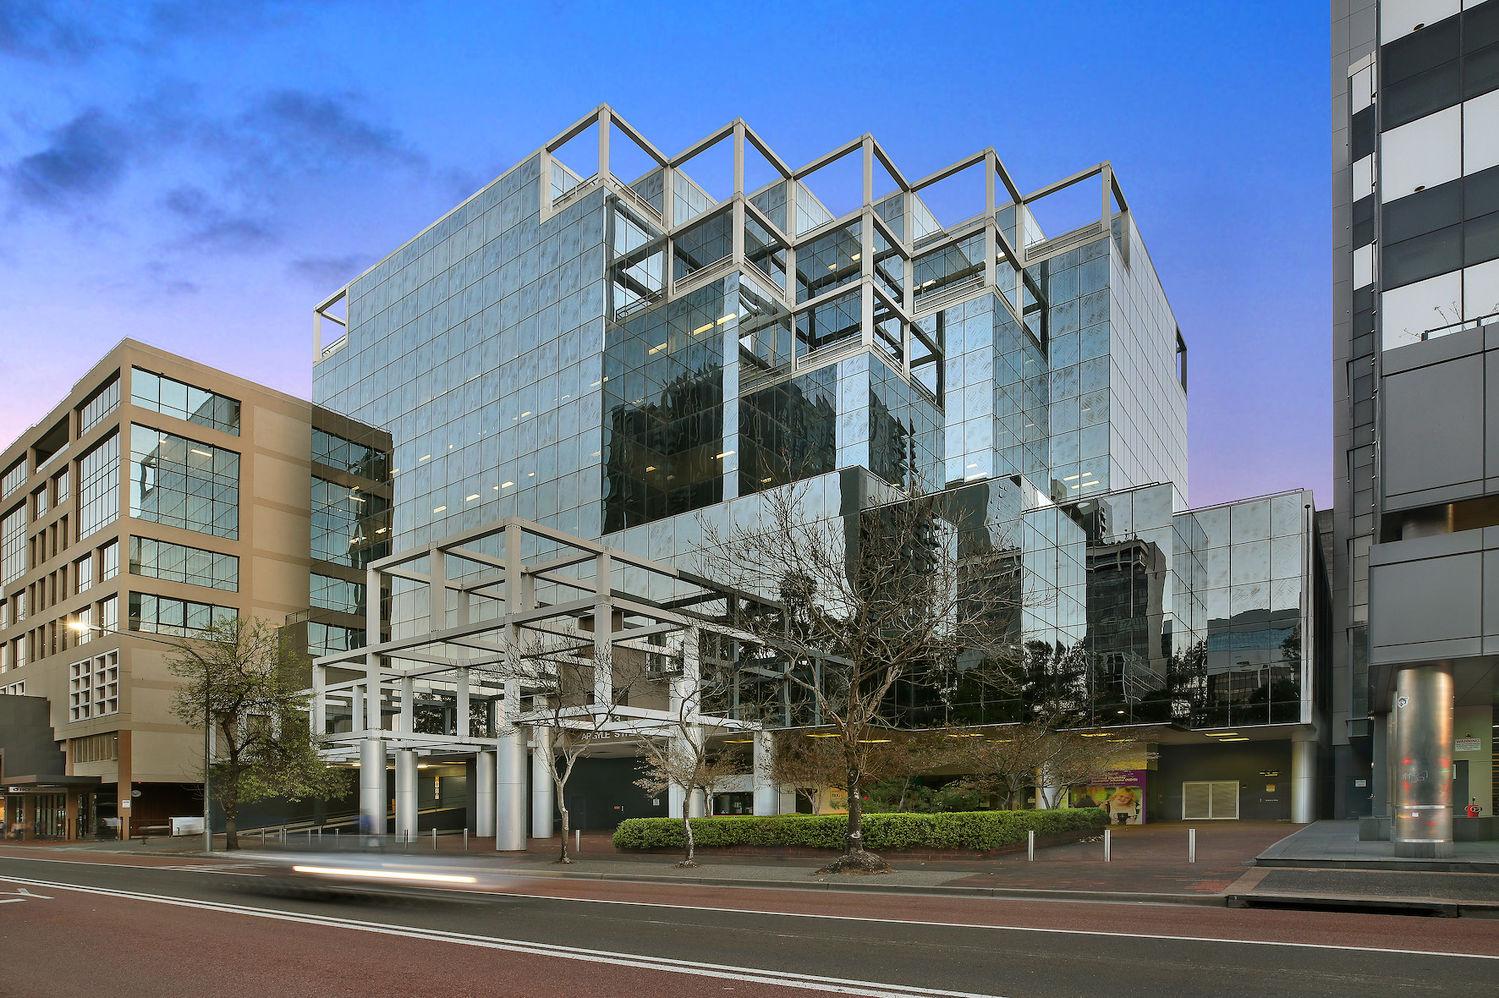 NSW Aboriginal Land Council's building - EDGEPROP SINGAPORE